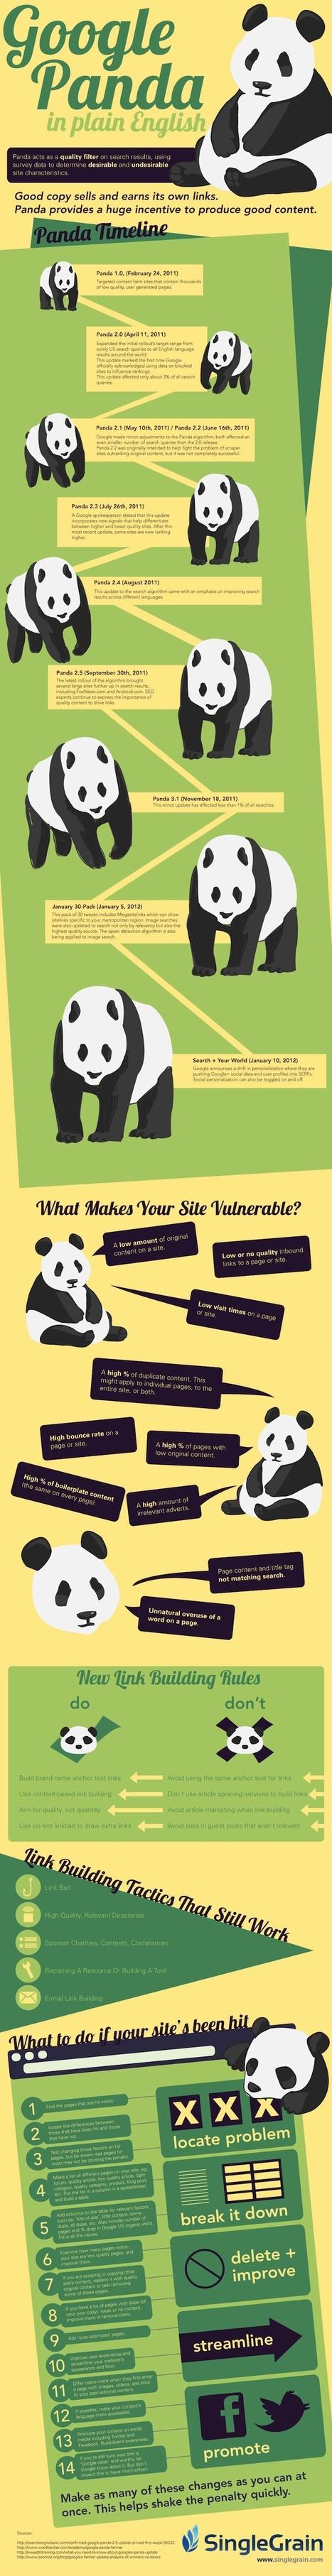 Don't Understand Google's Panda? An Infographic to Help   SEO Aware   My SEO Stuff   Scoop.it